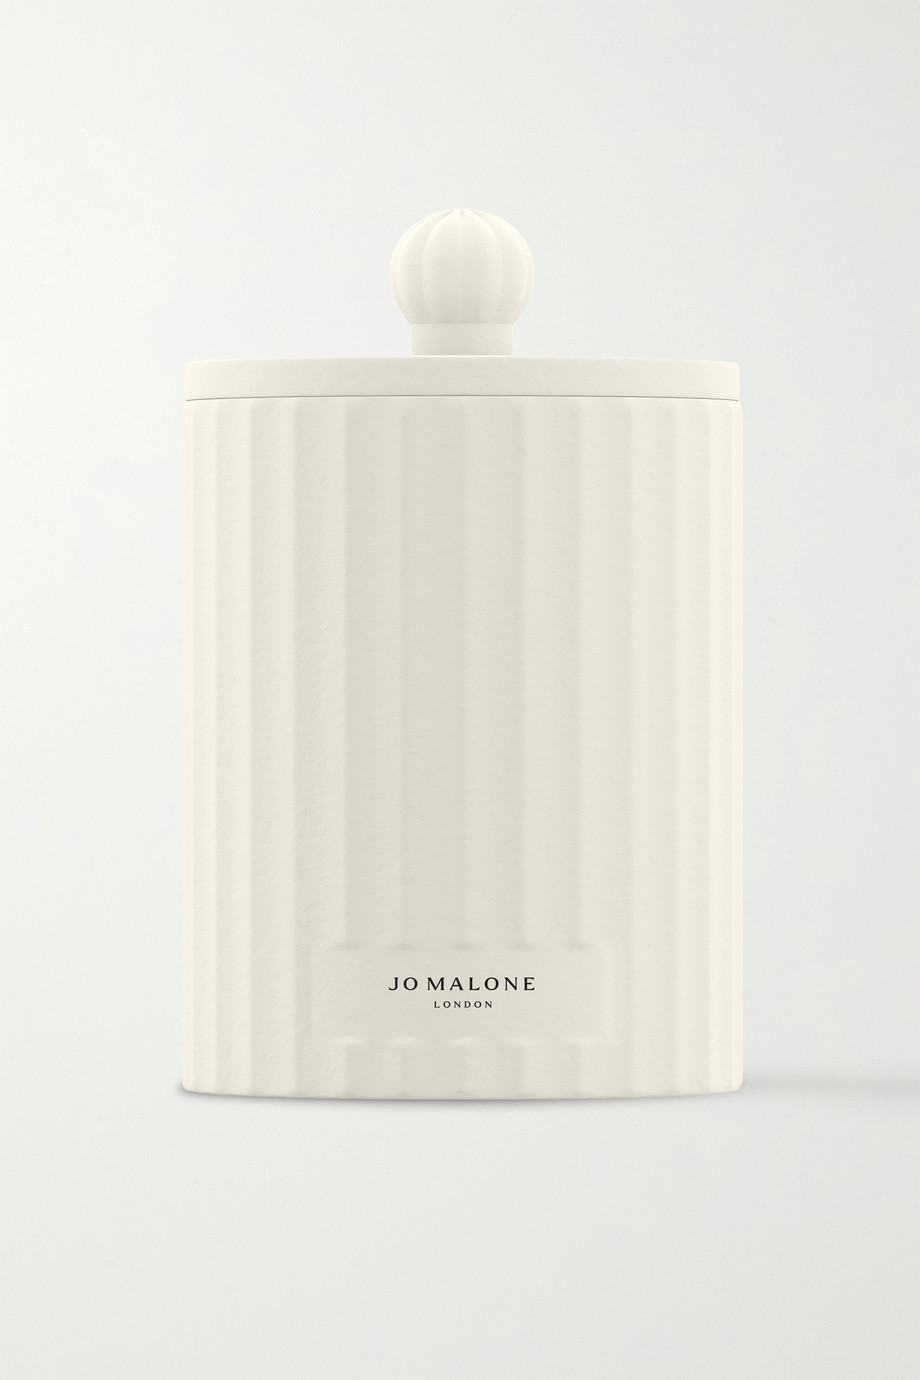 Jo Malone London Wild Berry & Bramble Scented Candle, 300g